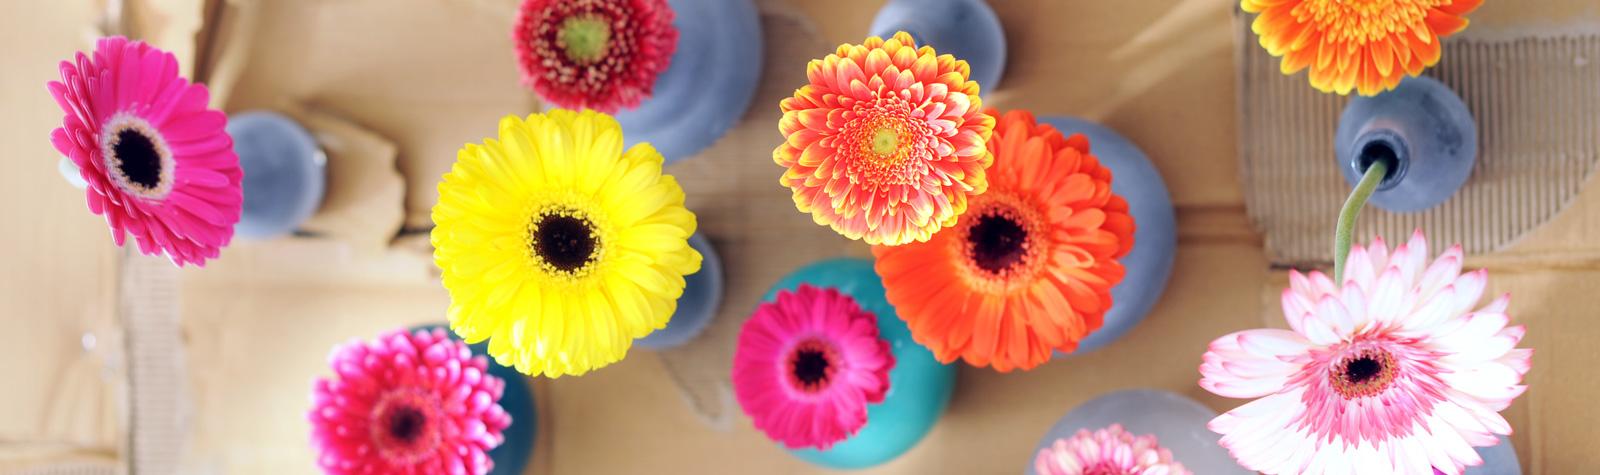 Interflora te regala 12 ramos de flores